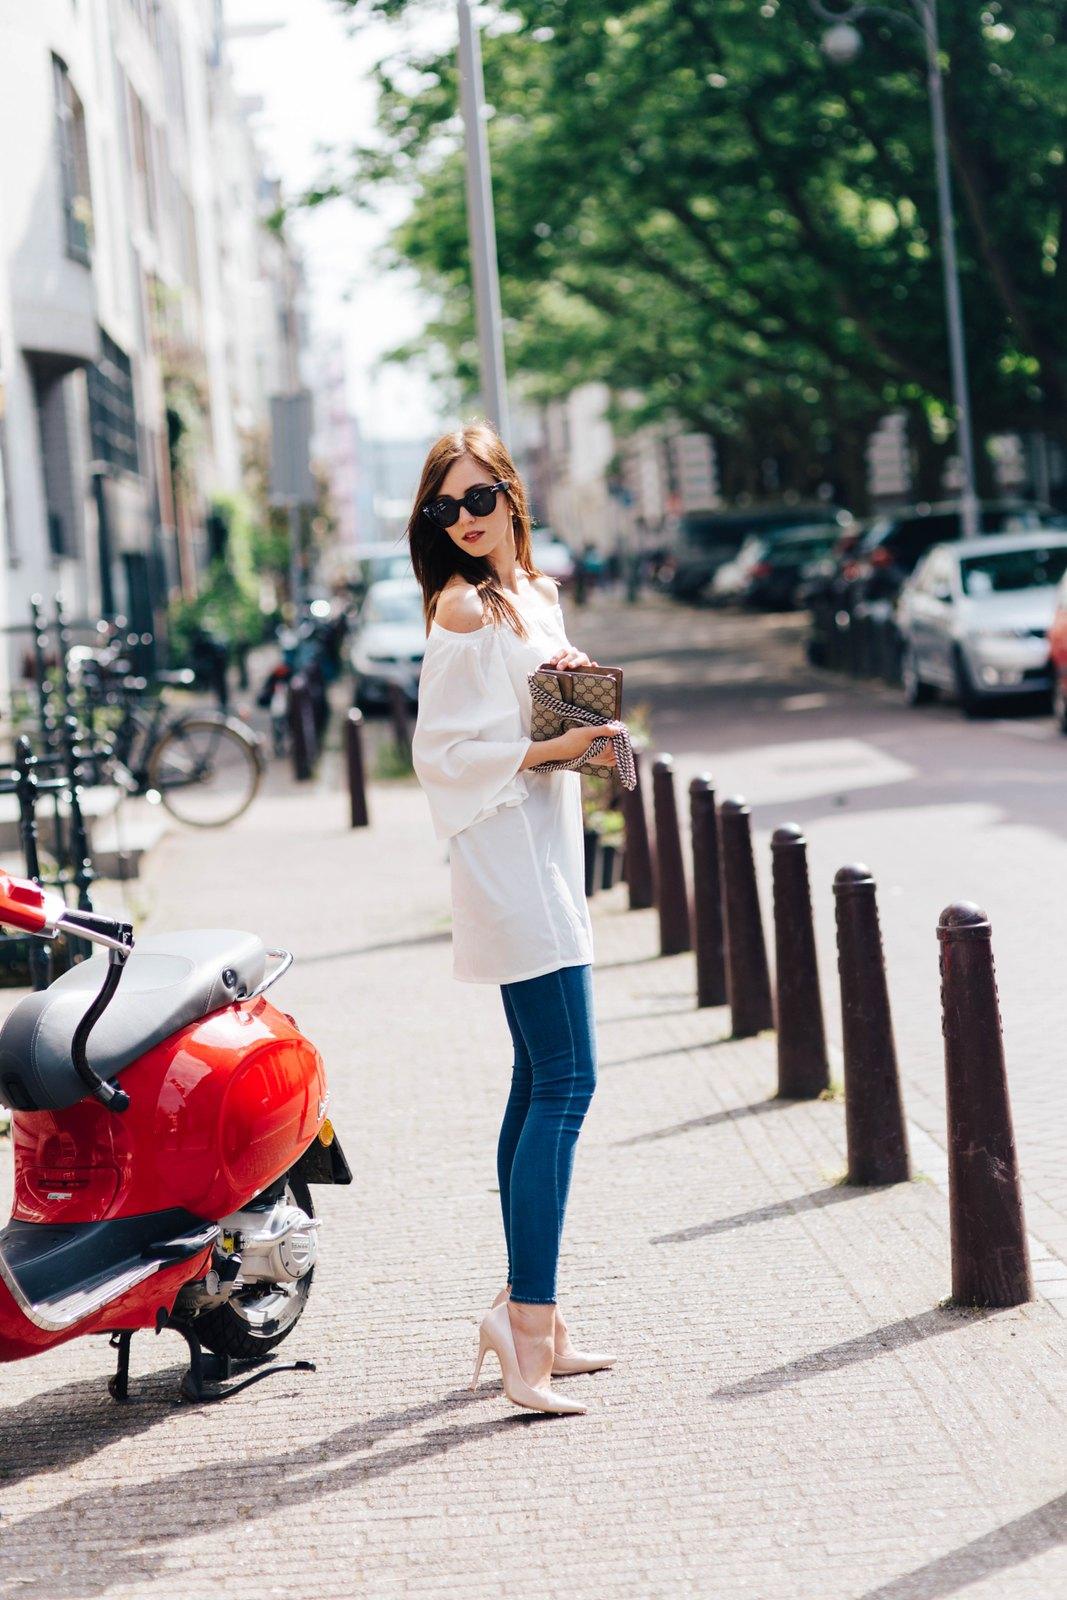 amsterdamphotowalk-133